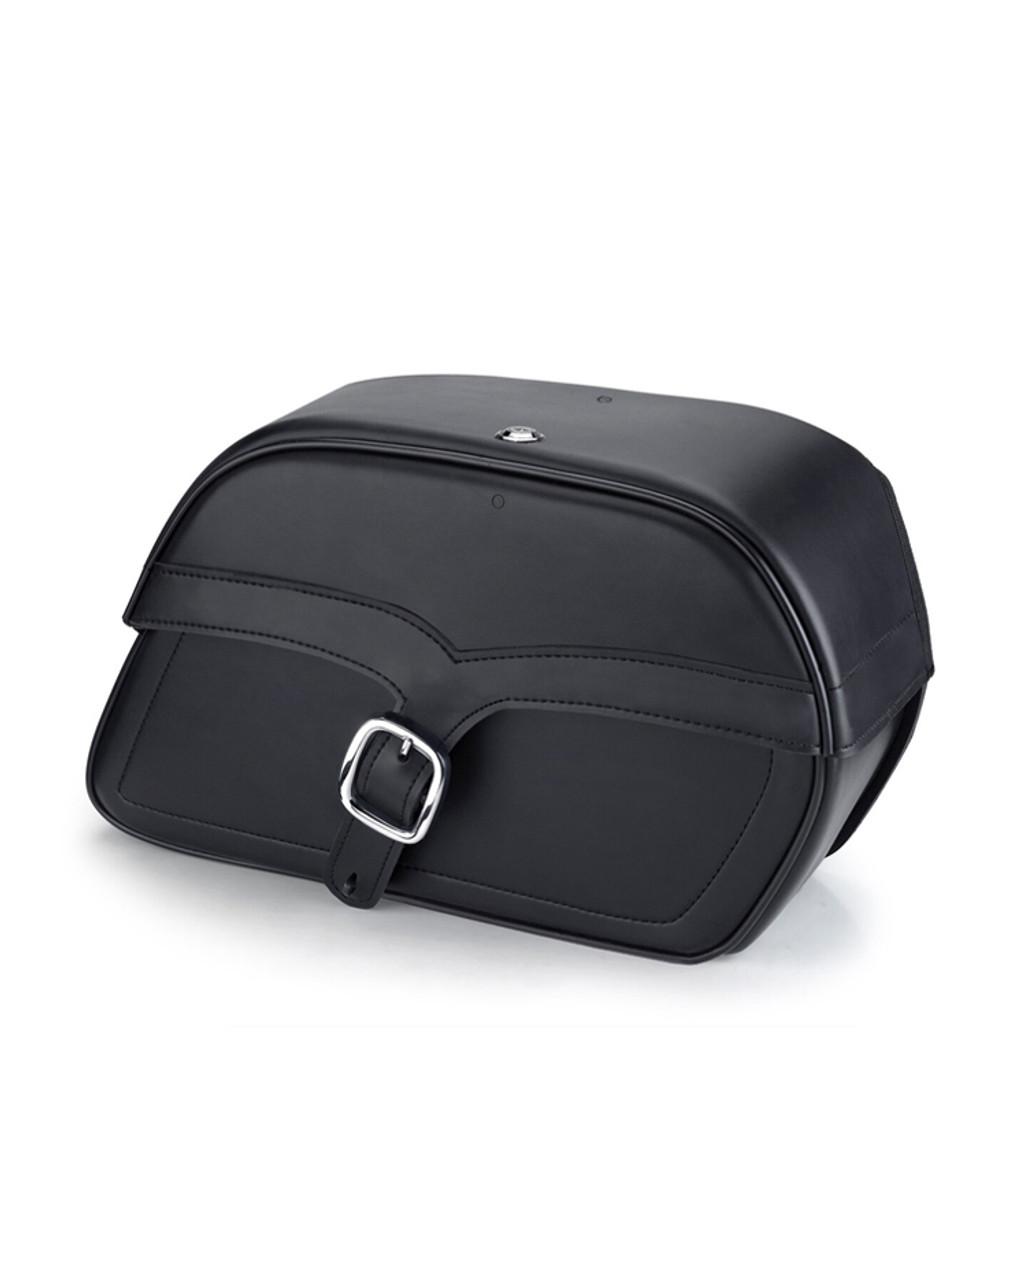 Victory High Ball Medium Charger Single Strap Motorcycle Saddlebags bag view